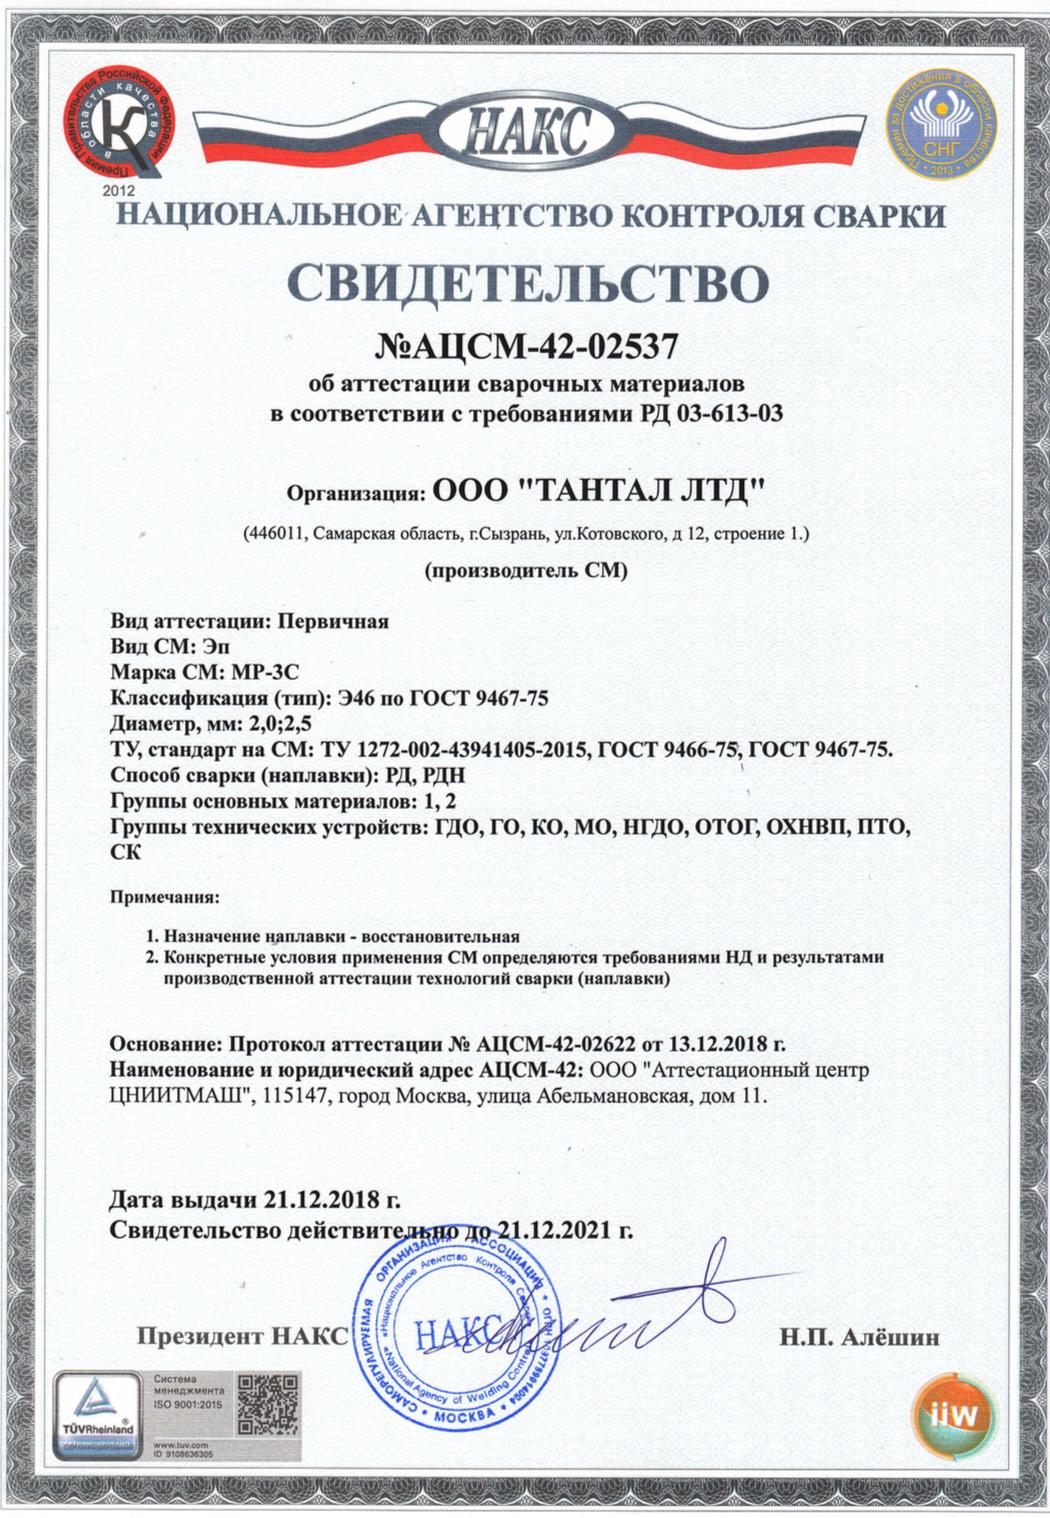 Свидетельство НАКС MP-3C (2мм-2,5мм)